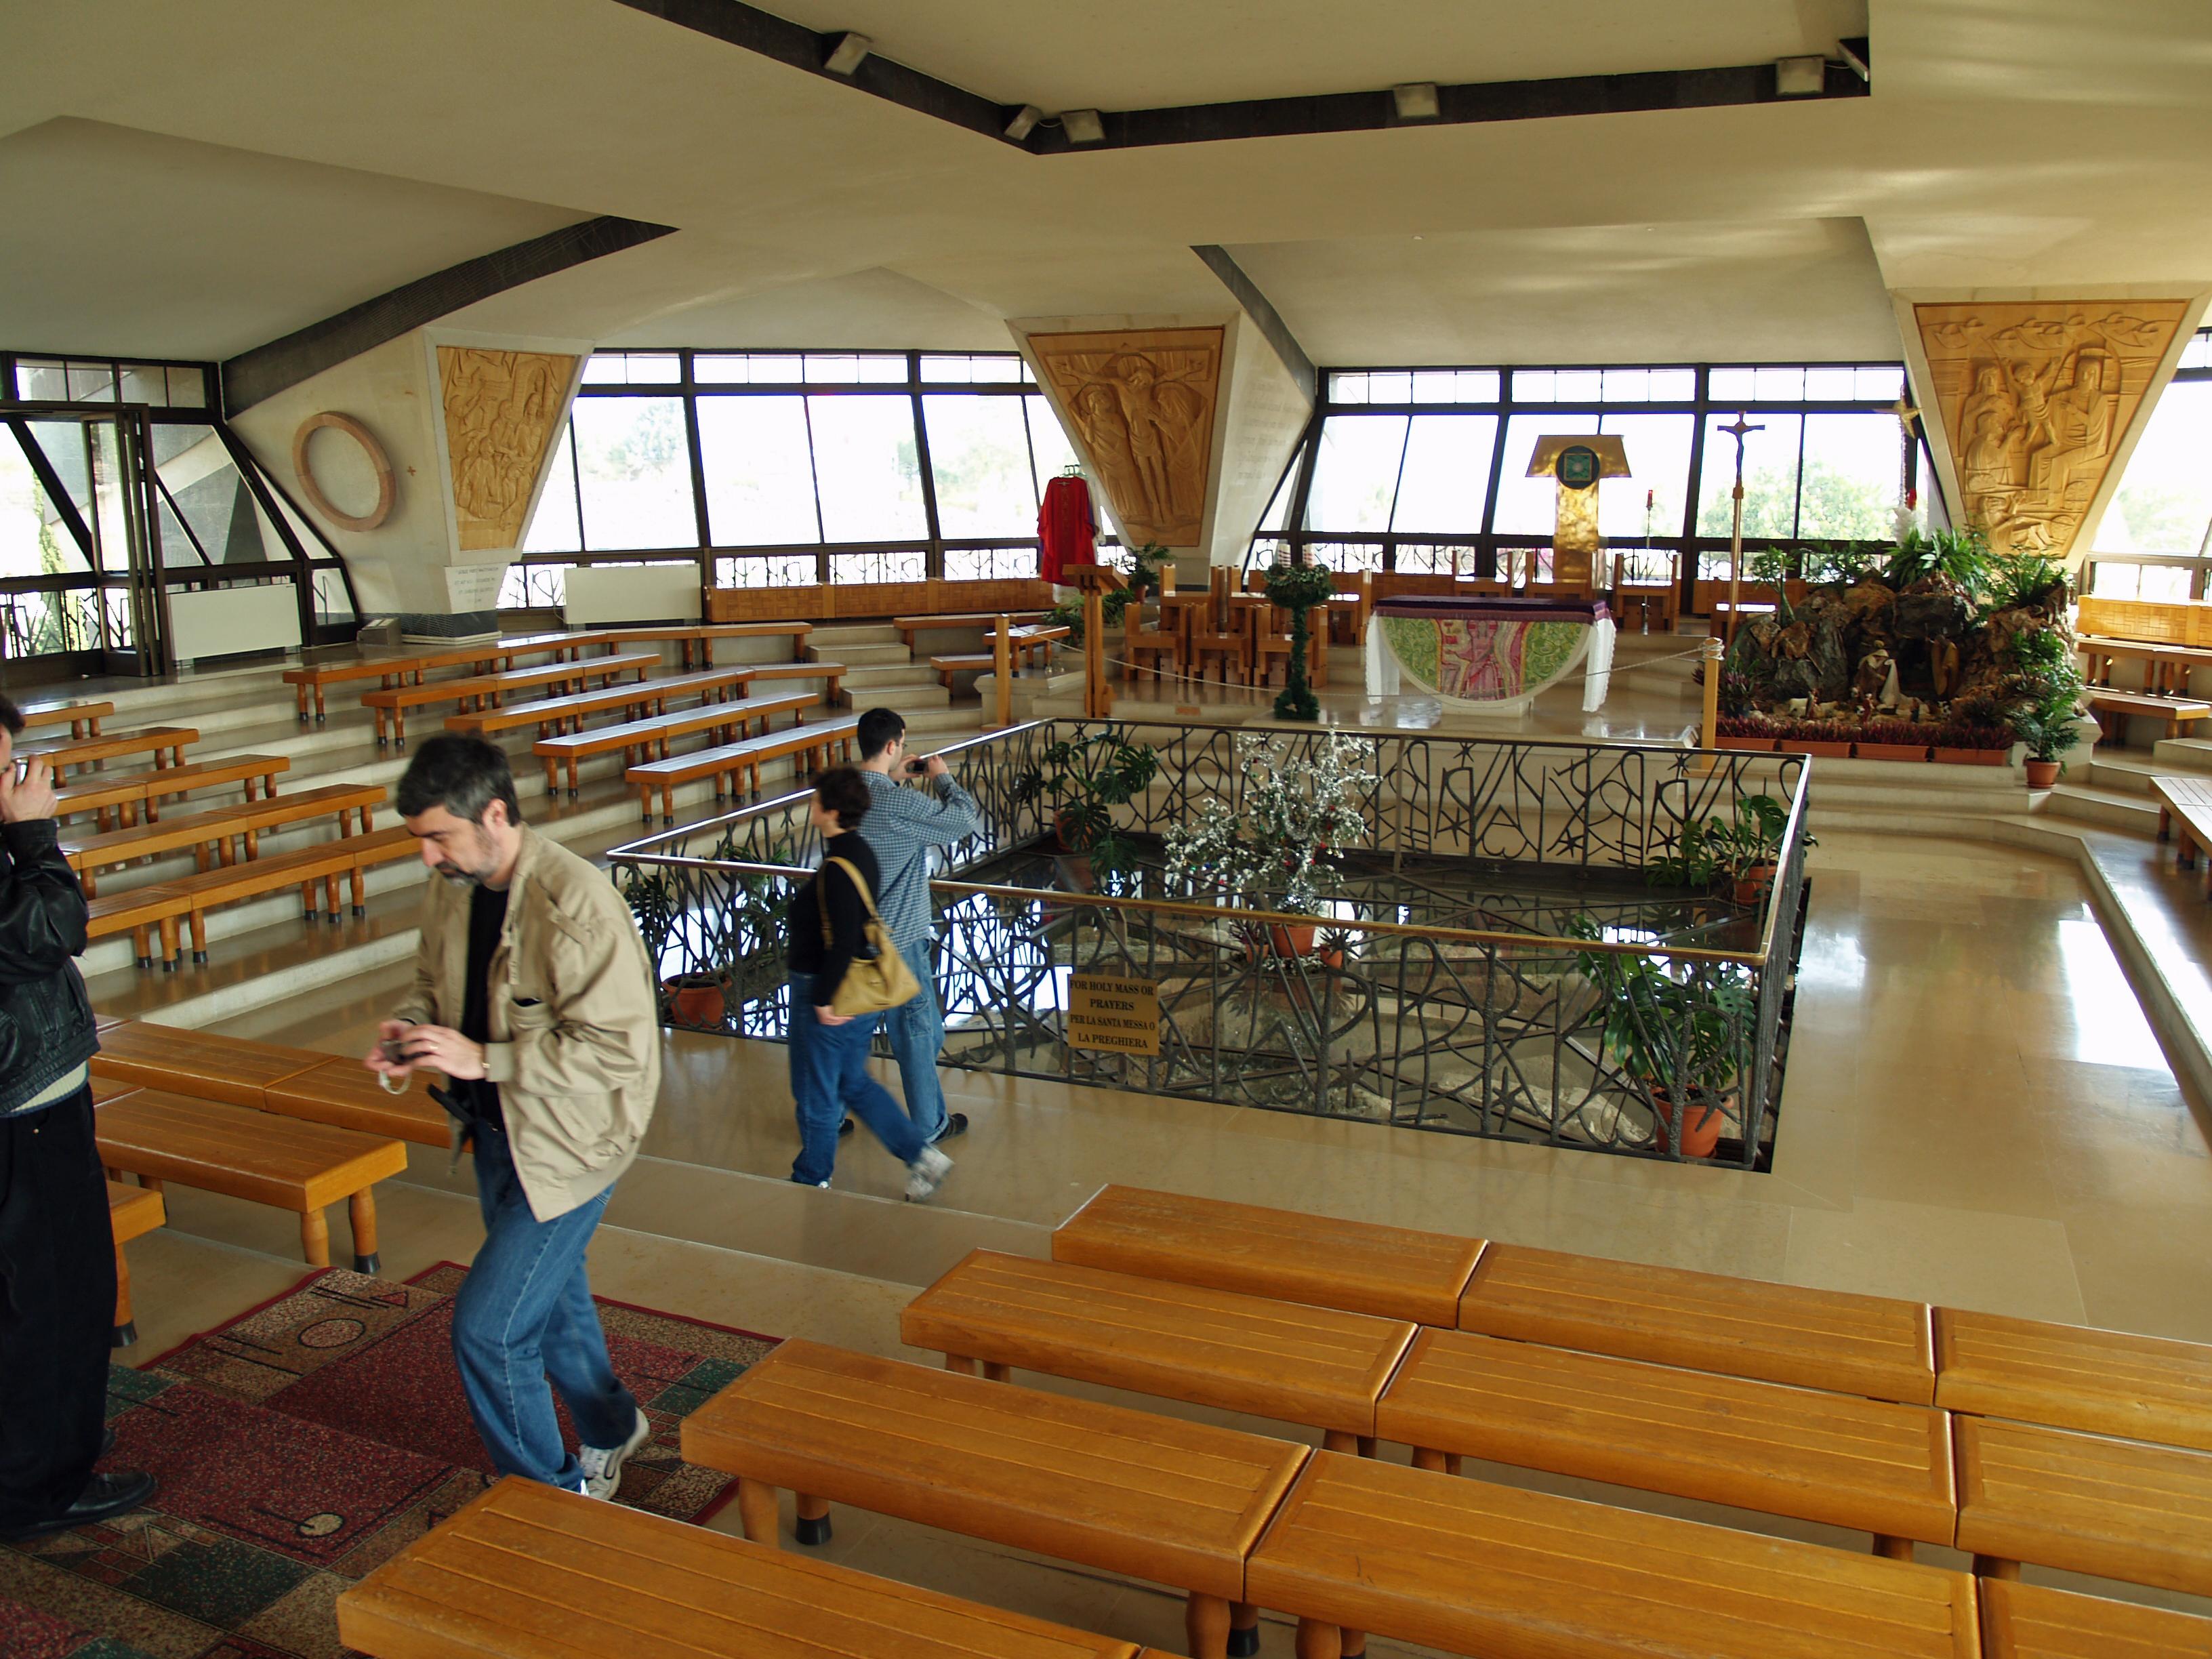 File:Capernaum modern church interior by David Shankbone ...